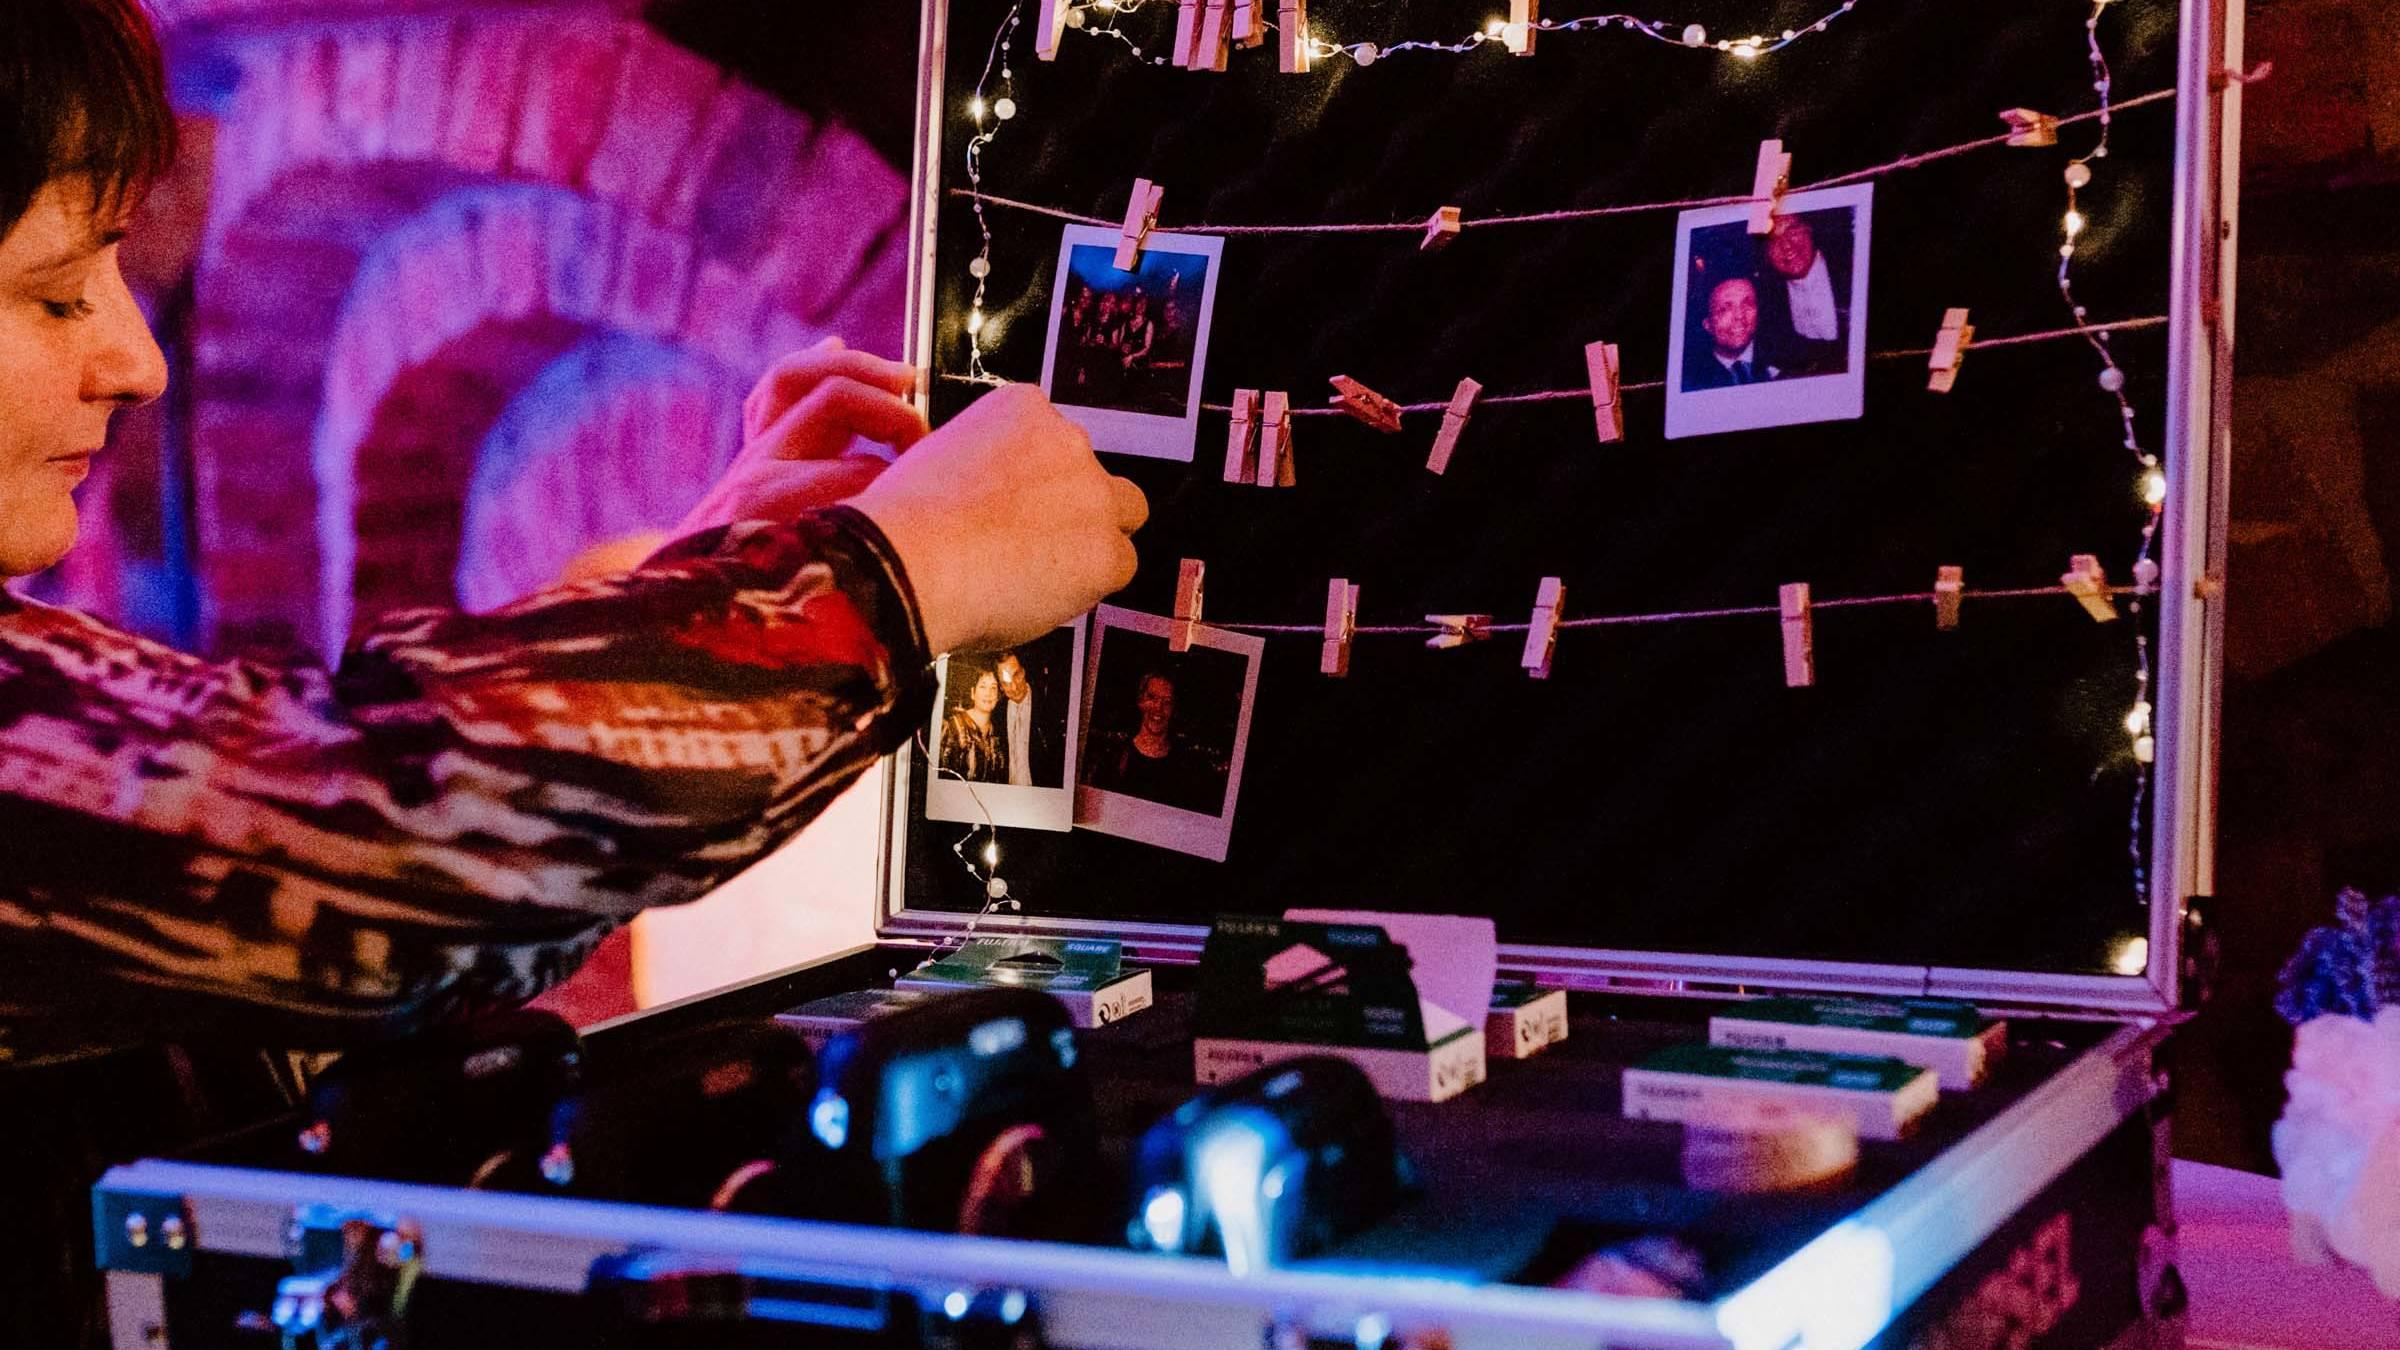 Hamburgfeiert  Partner  Knipsel  Polaroid  Kamera  Mieten  Hochzeit  Polaroid  Fotograf  Set  Event  Mieten  Instax  Leihen  Event  Hochzeit  Sofortbildkamera